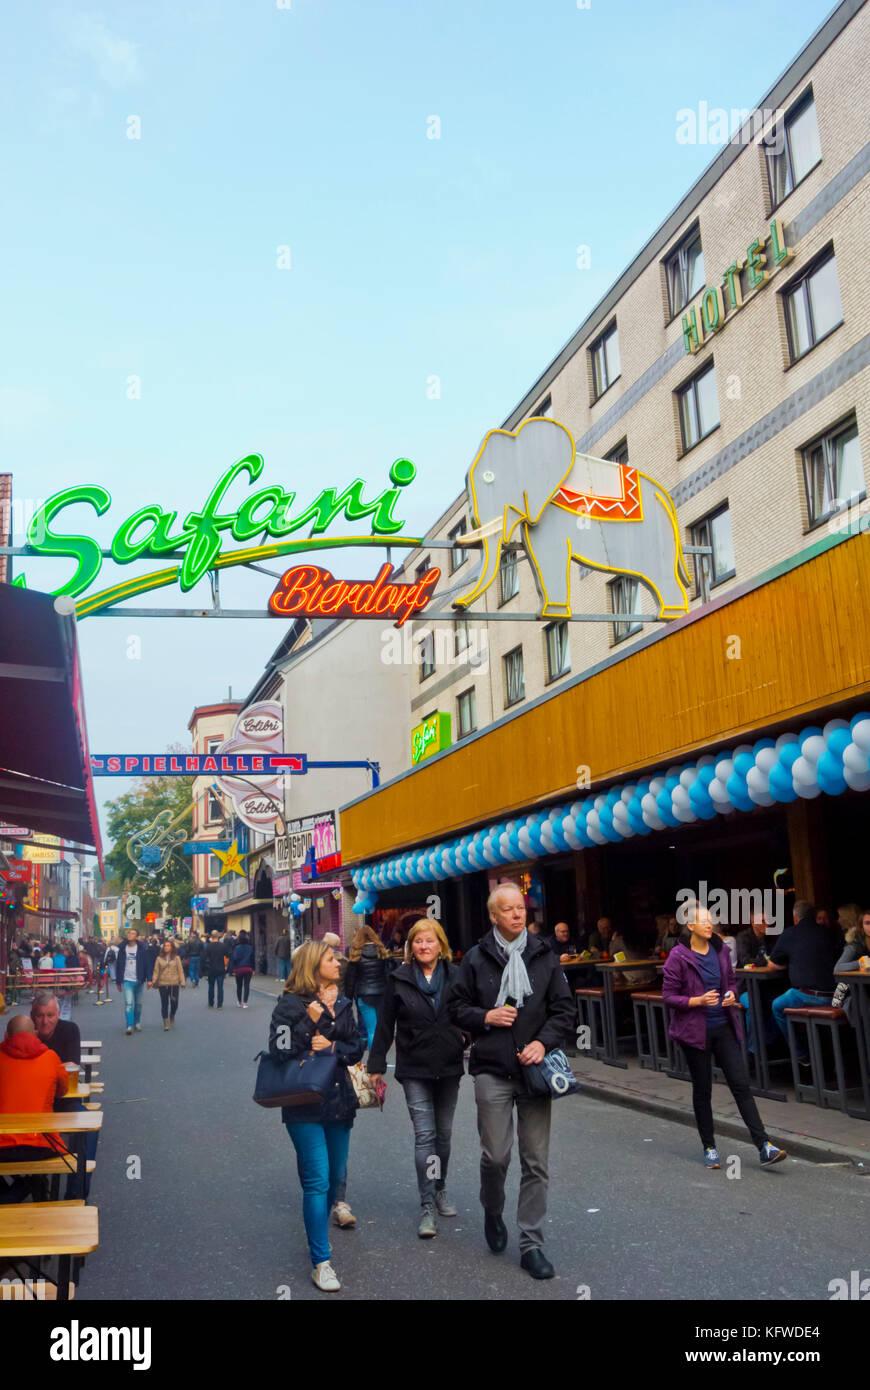 Grosse Freiheit street, St Pauli district, Hamburg, Germany - Stock Image